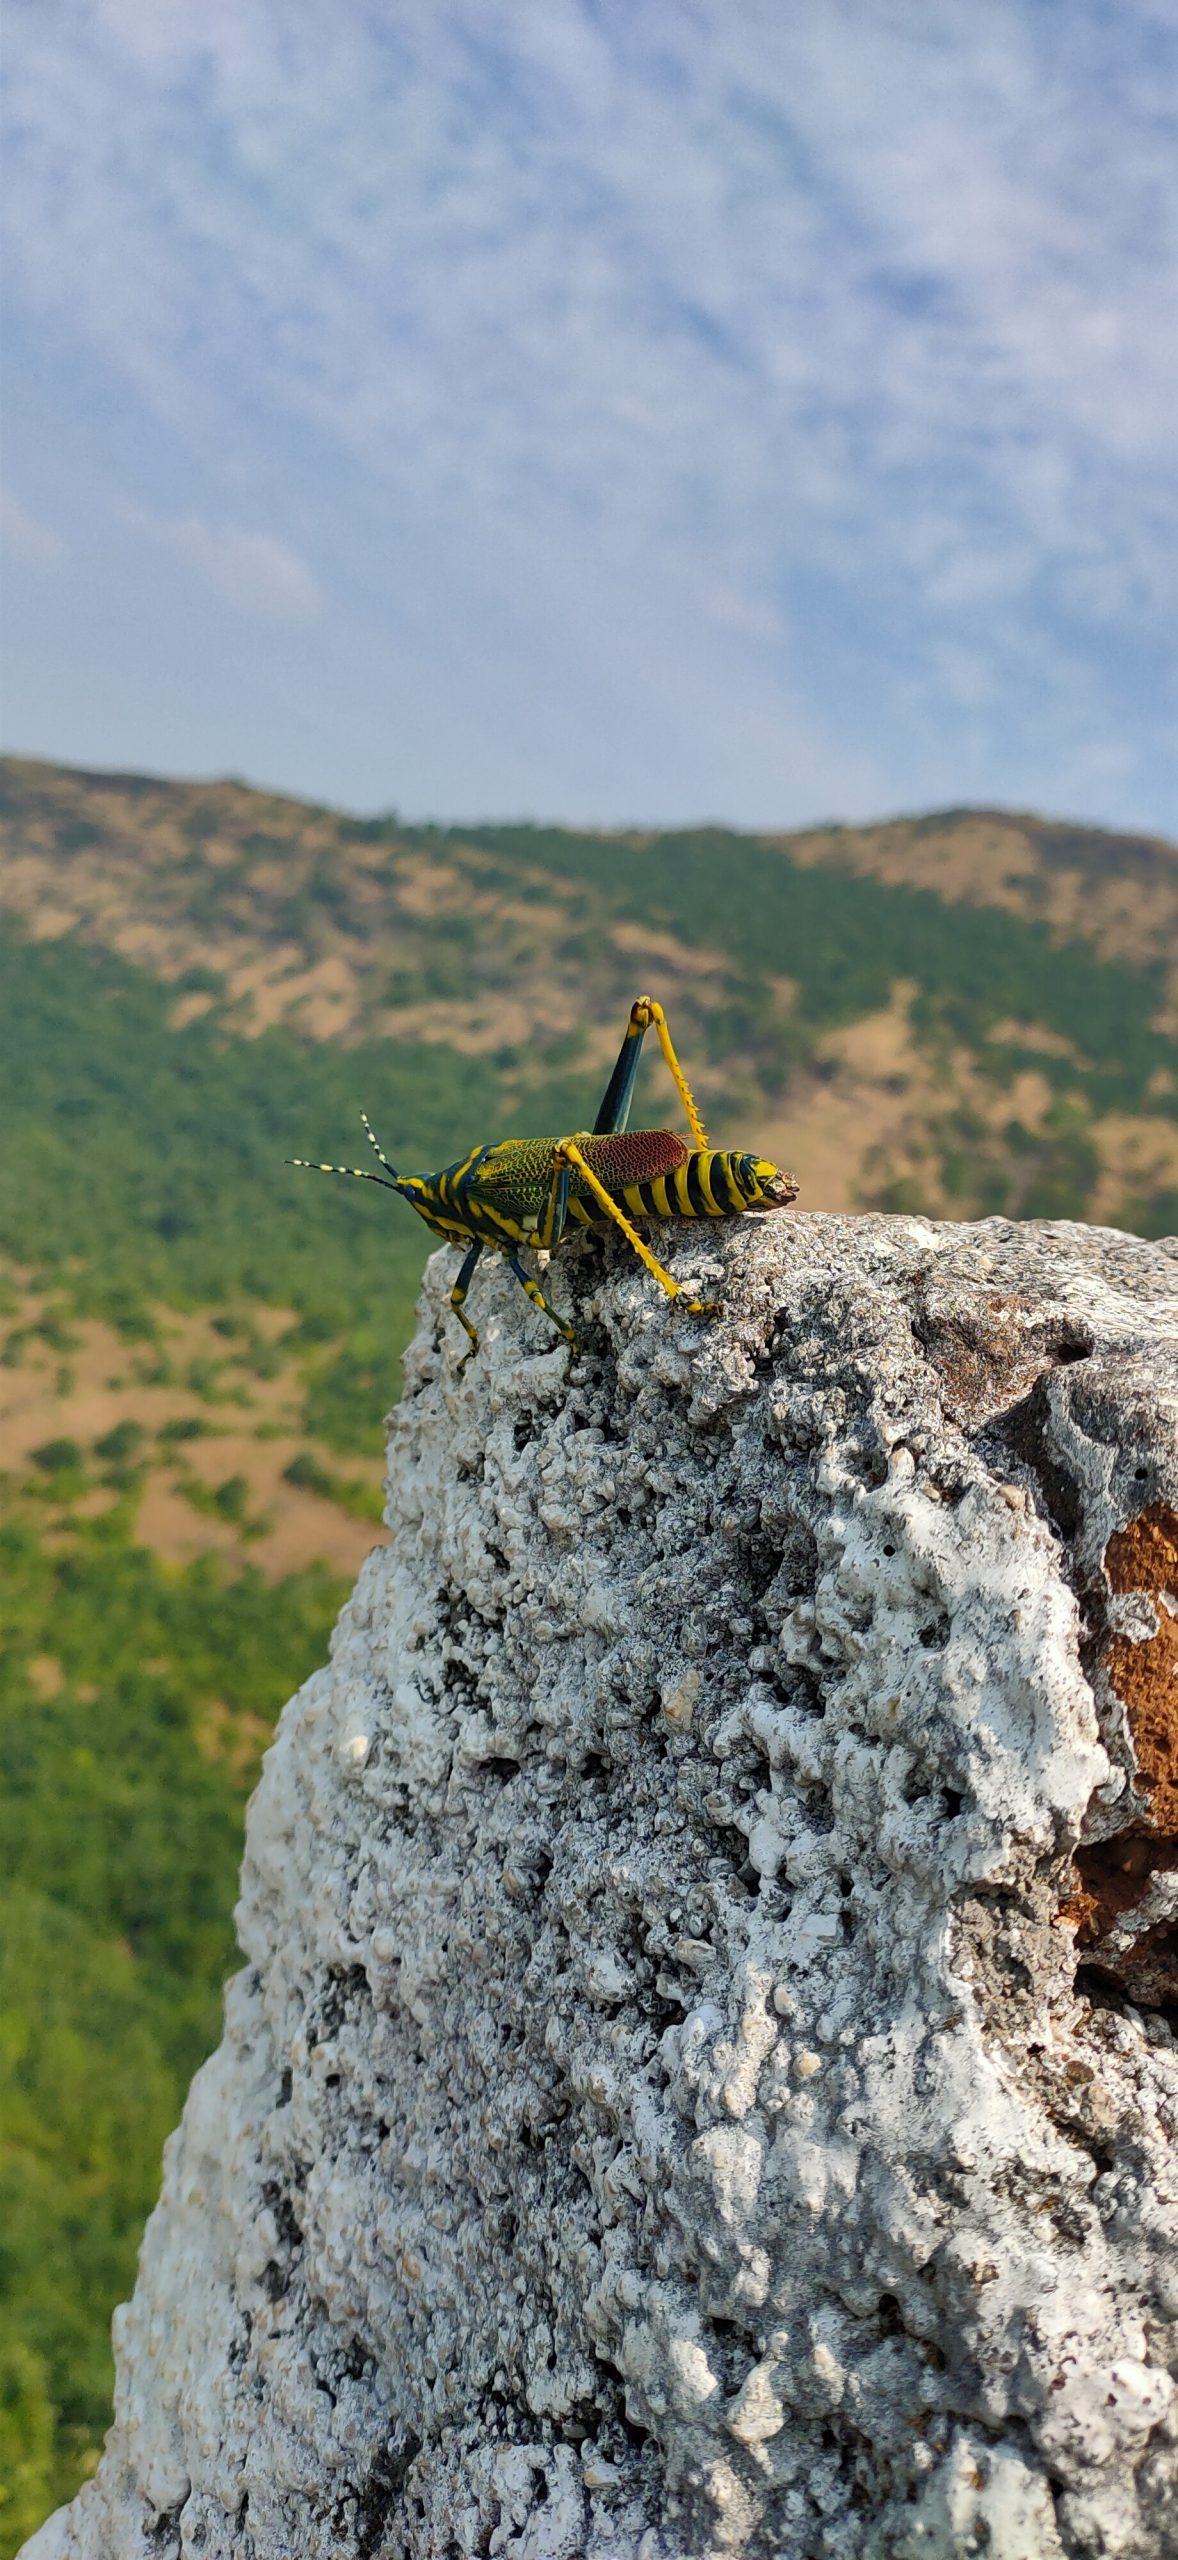 A grasshopper on a rock